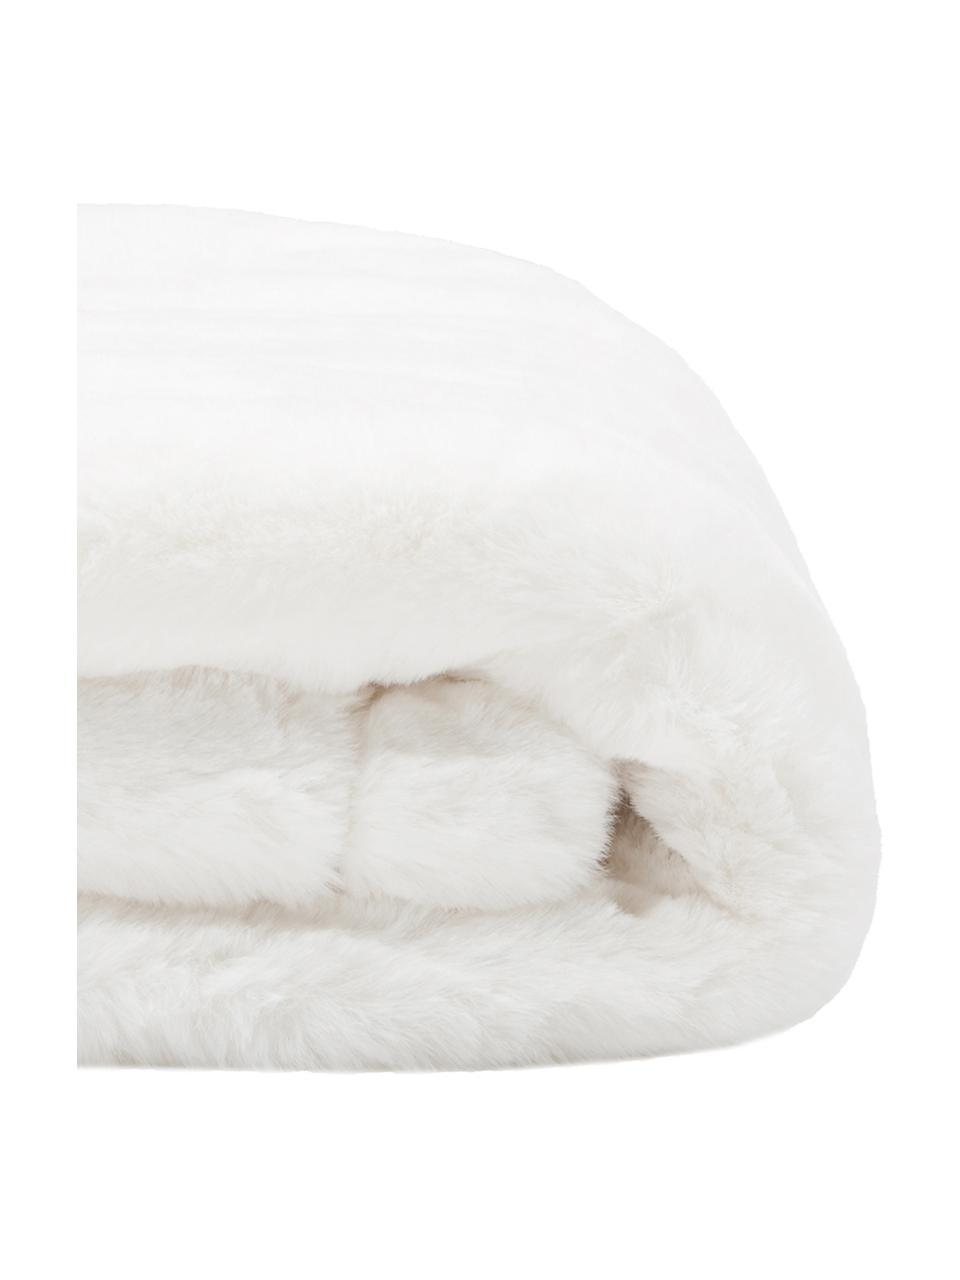 Kunstfell-Plaid Mette, glatt, Vorderseite: 100% Polyester, Rückseite: 100% Polyester, Creme, 150 x 200 cm